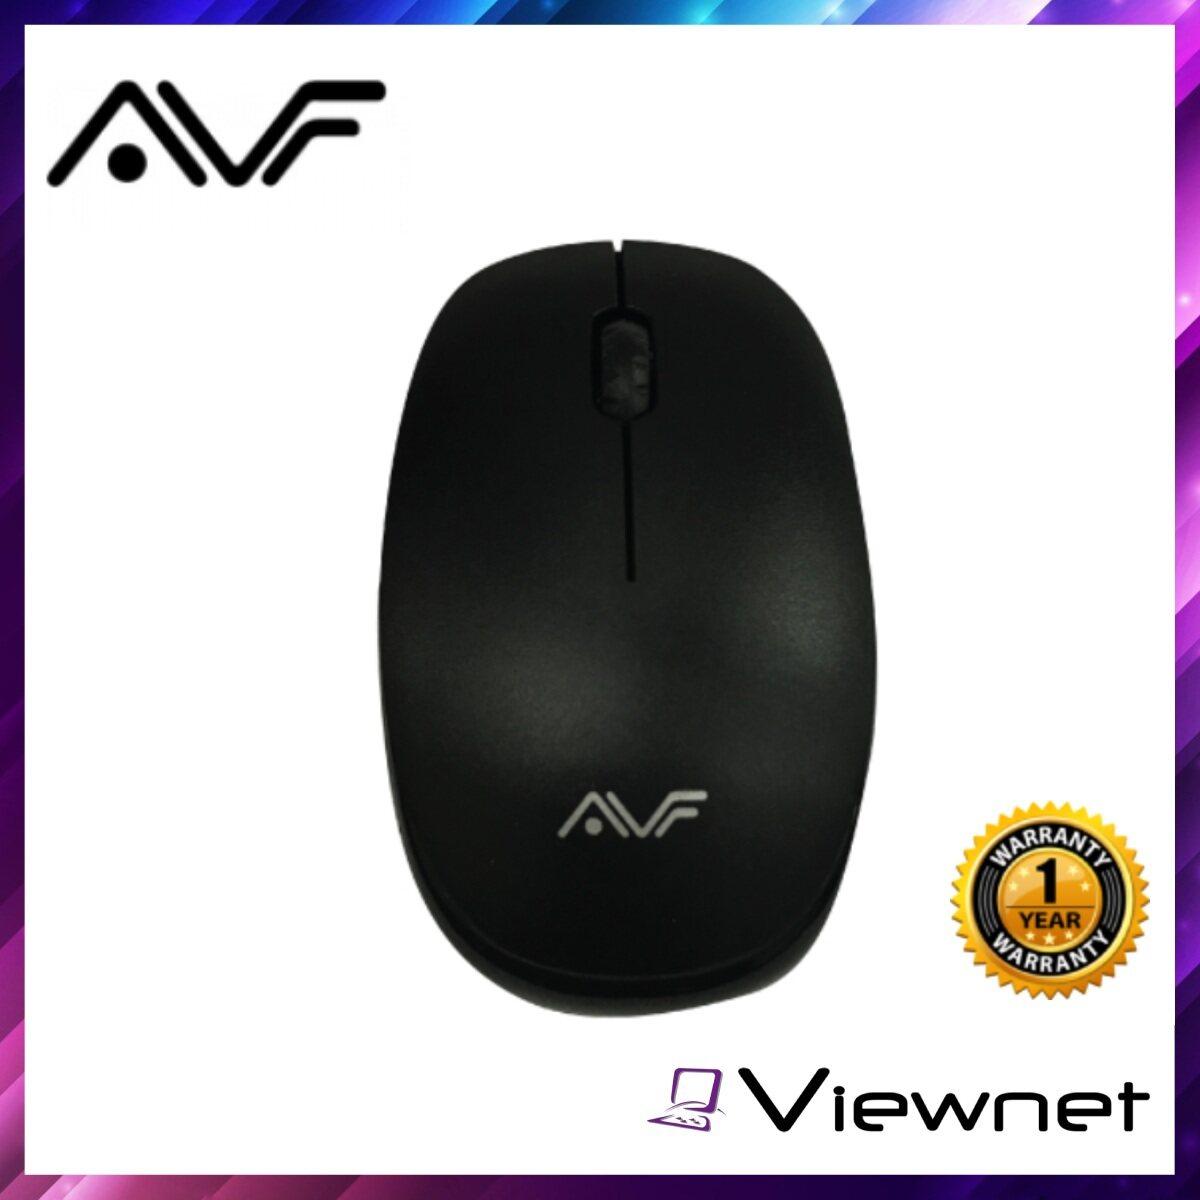 AVF AM-4G Wireless Mouse (AM-4G), Black, 2.4G Wireless Mouse, 1600 Dpi